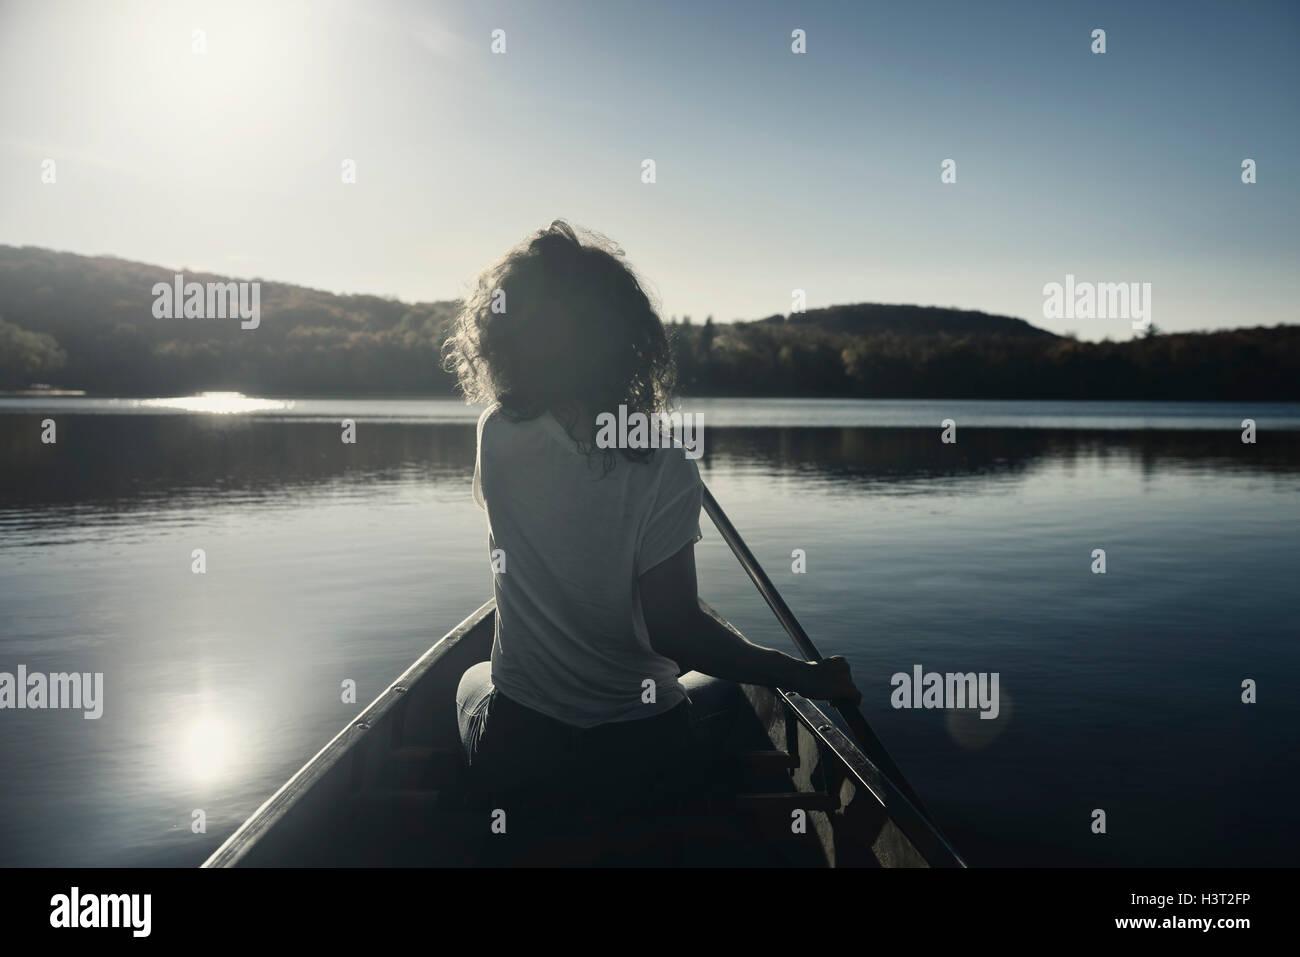 Jeune femme canoë sur un lac à l'automne. Muskoka, Ontario, Canada. Photo Stock